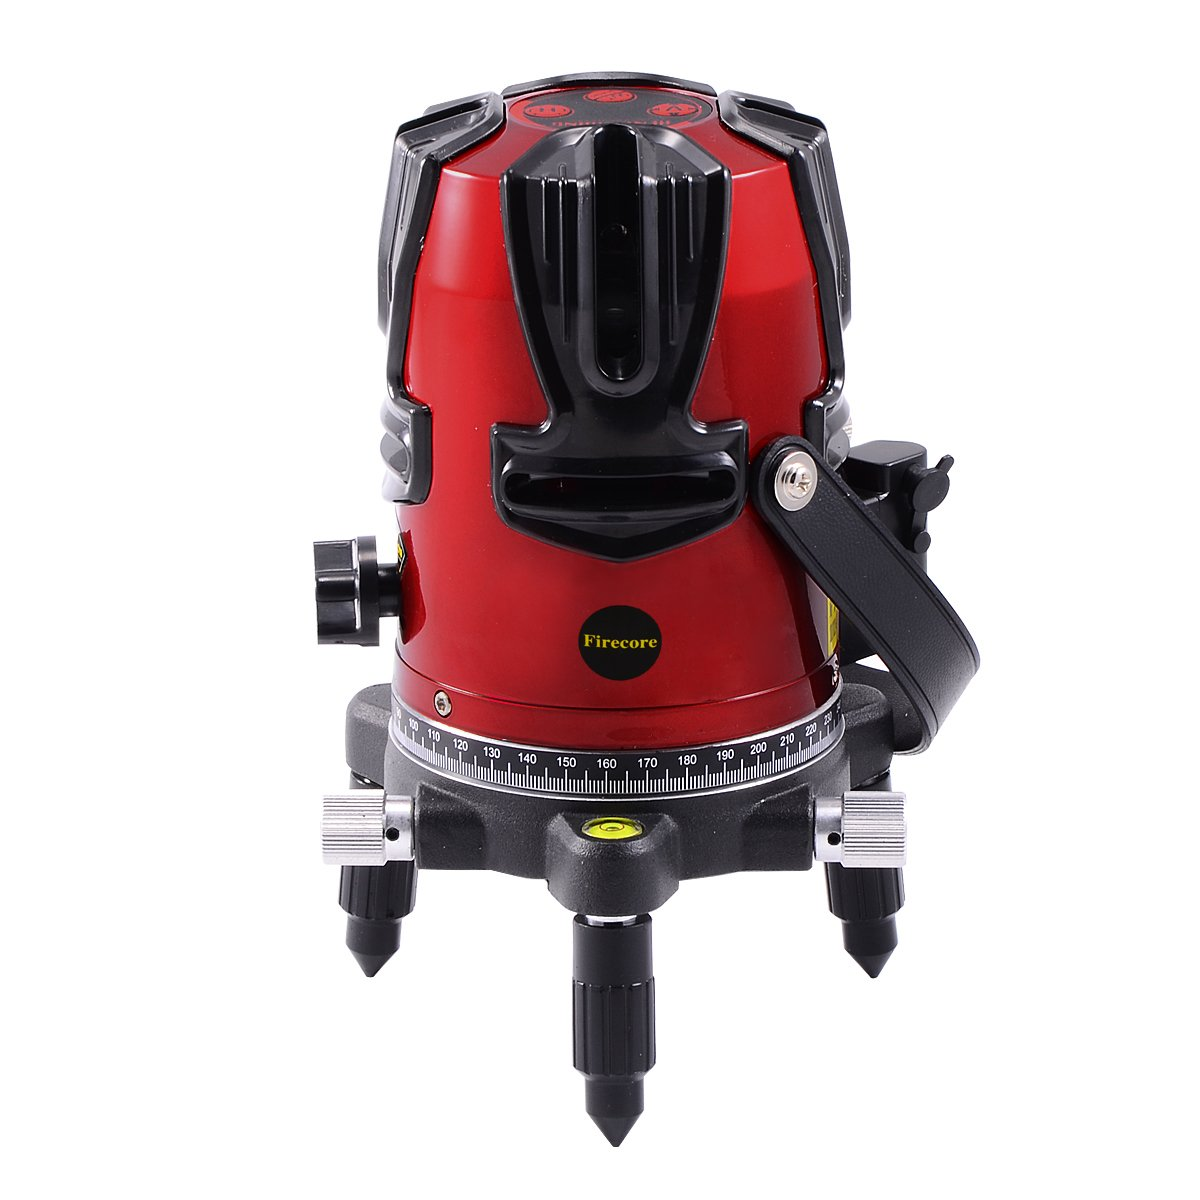 Firecore 8ラインレーザー墨出し器 FR8 4垂直 4水平 2増強ポイント 1地墨ポイント /レーザー墨出器 /建築/測量